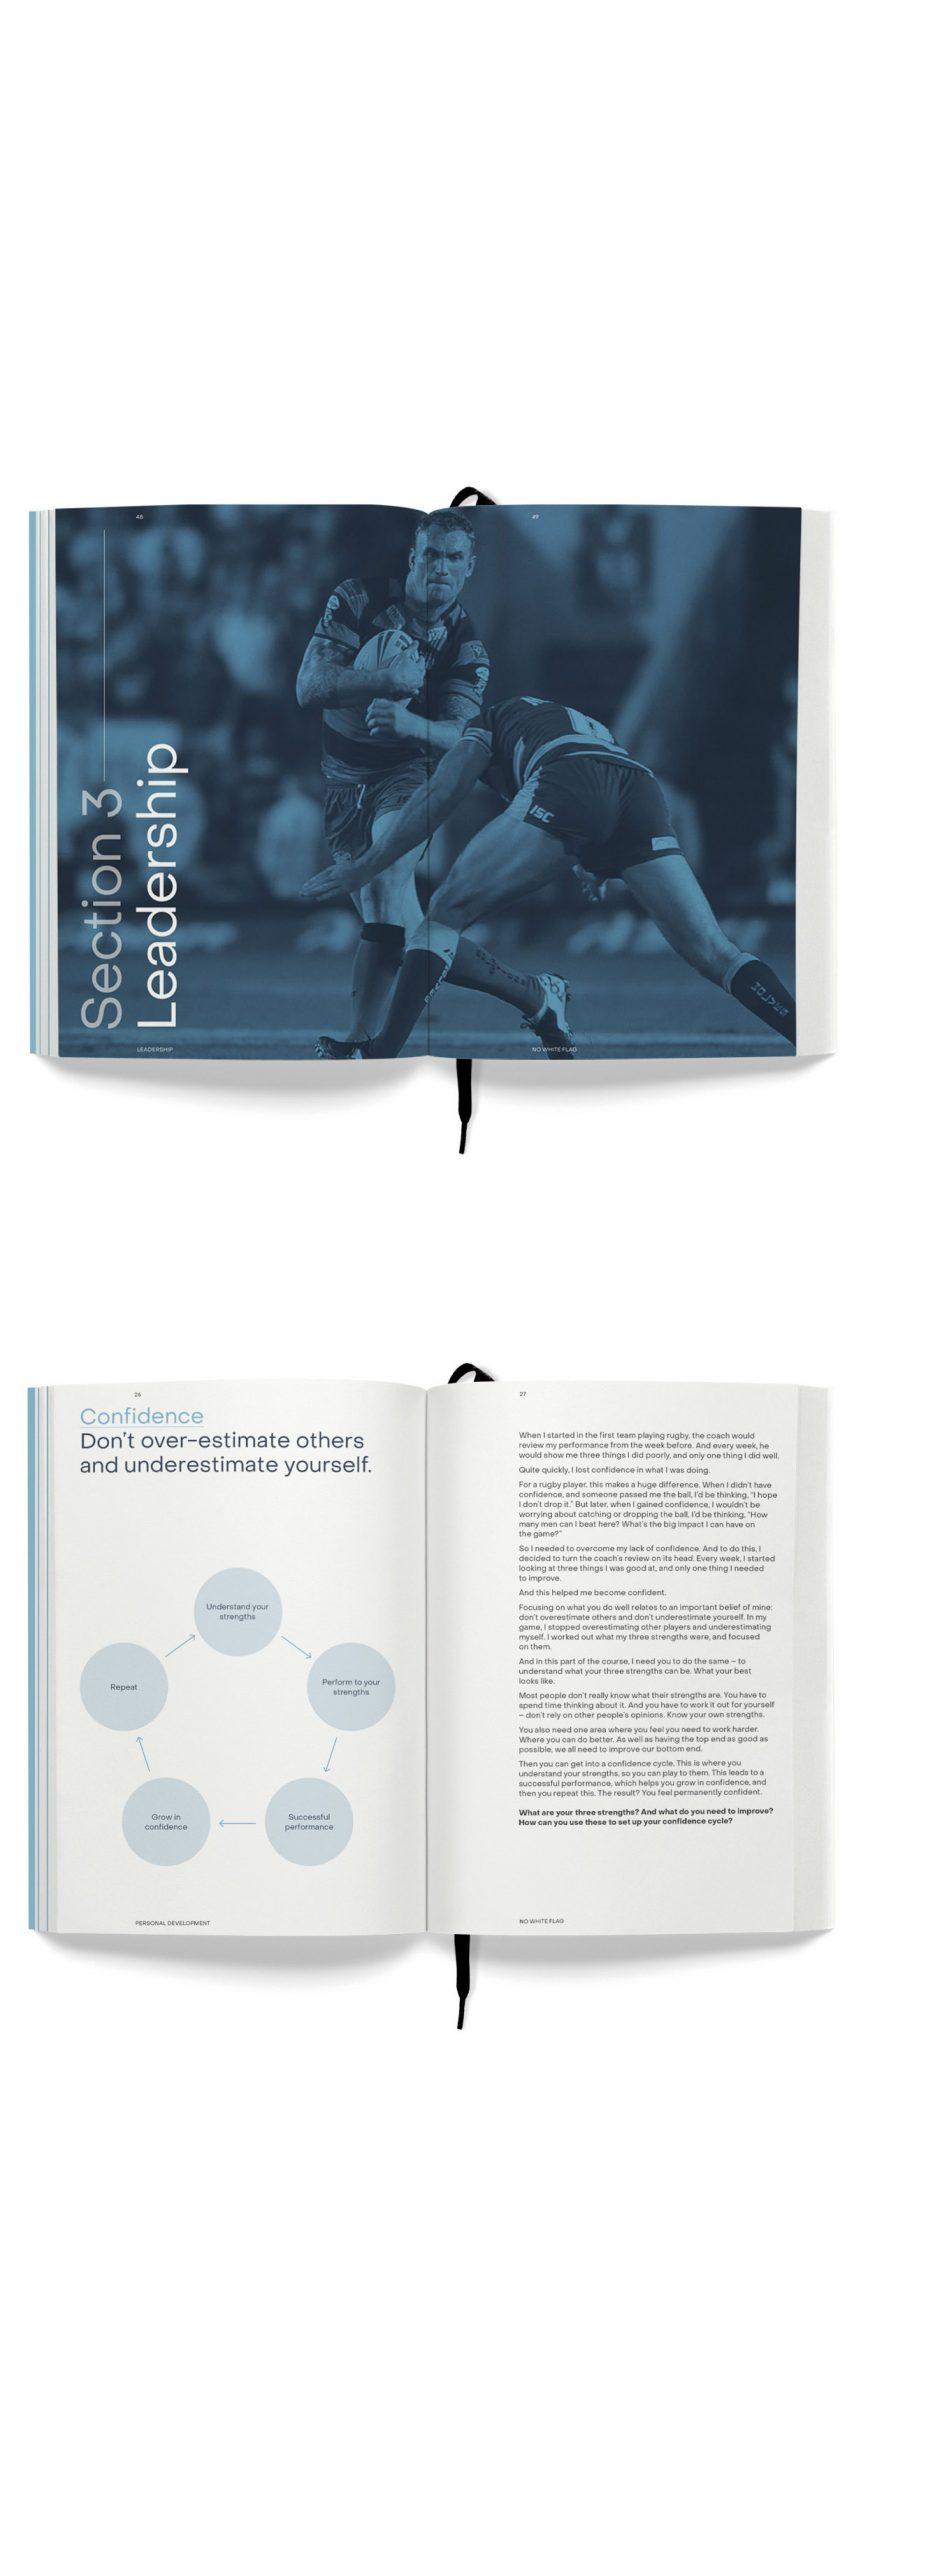 Jamie Peacock Leadership Training Manual design by Leeds based Freelance Designer Neil Holroyd